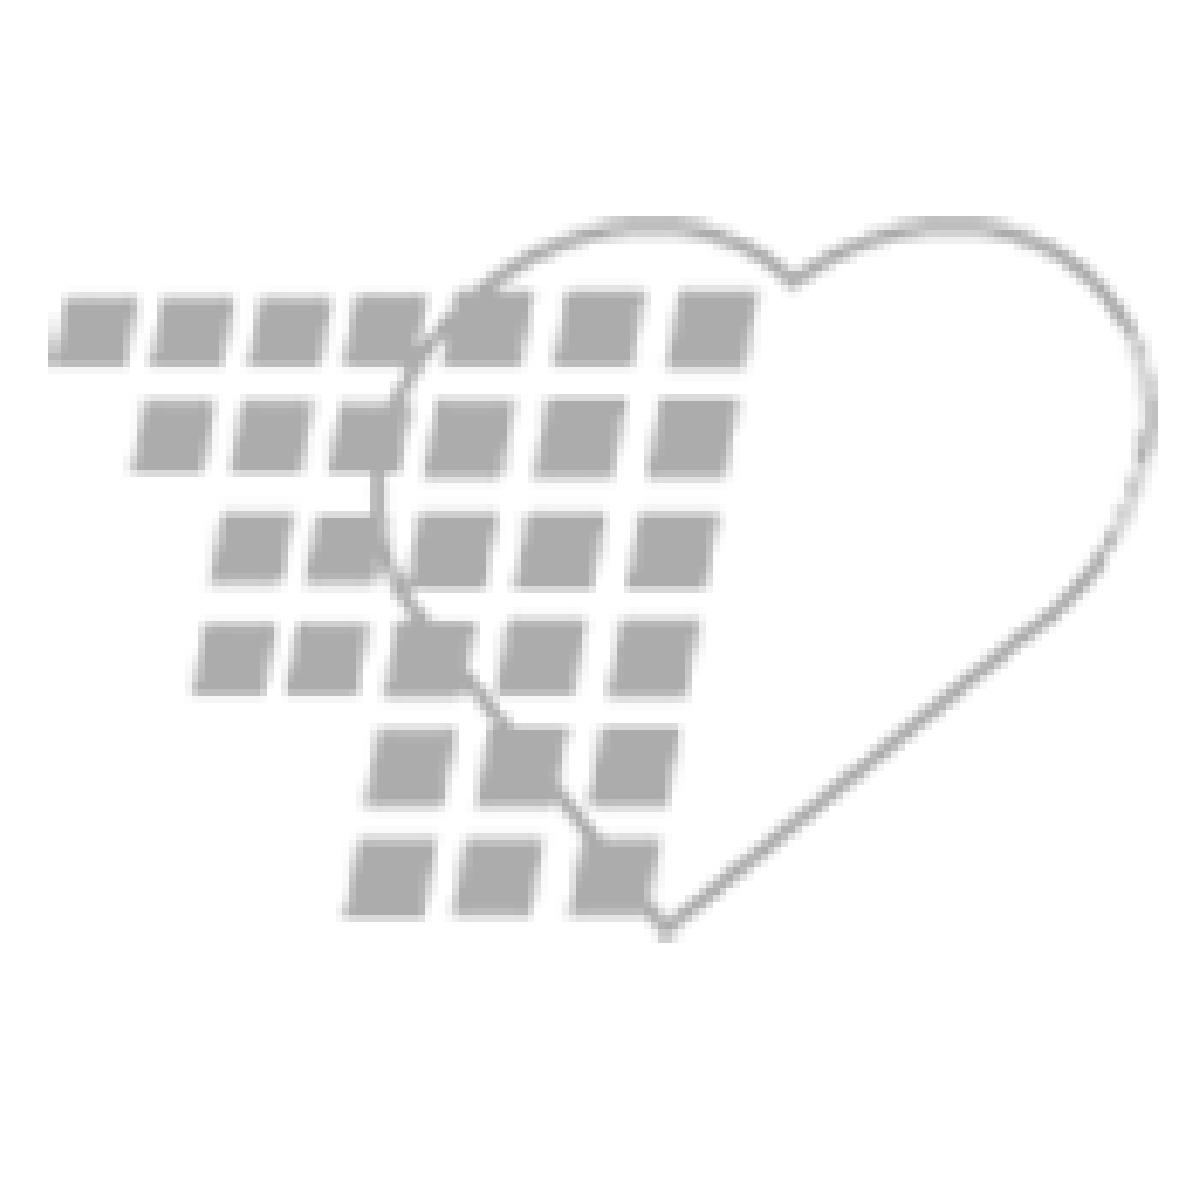 05-84-9683 MEDSOFT™ Pillow Reusable (Not Washable) 20 x 26 Inch - White